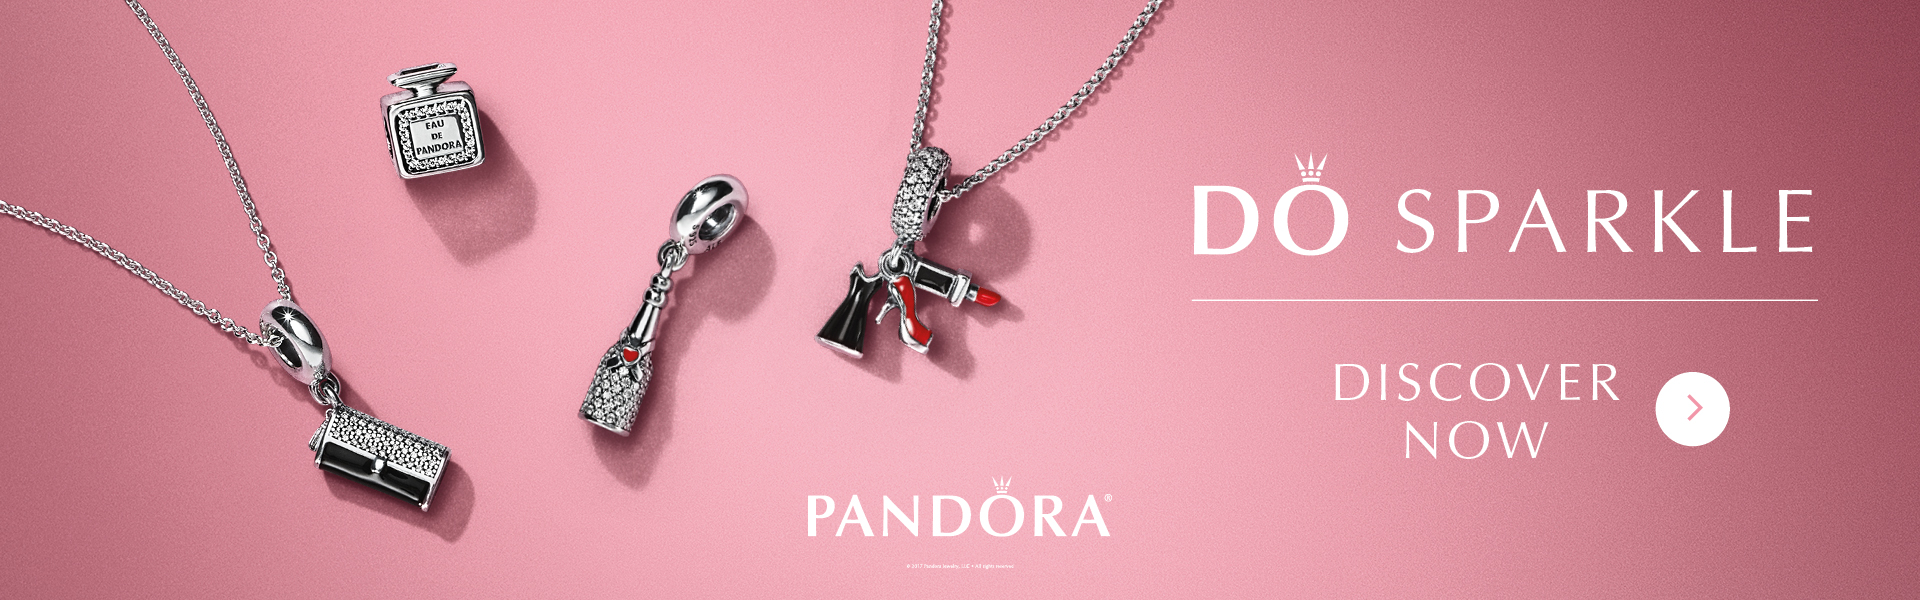 Pandora Sparkle!